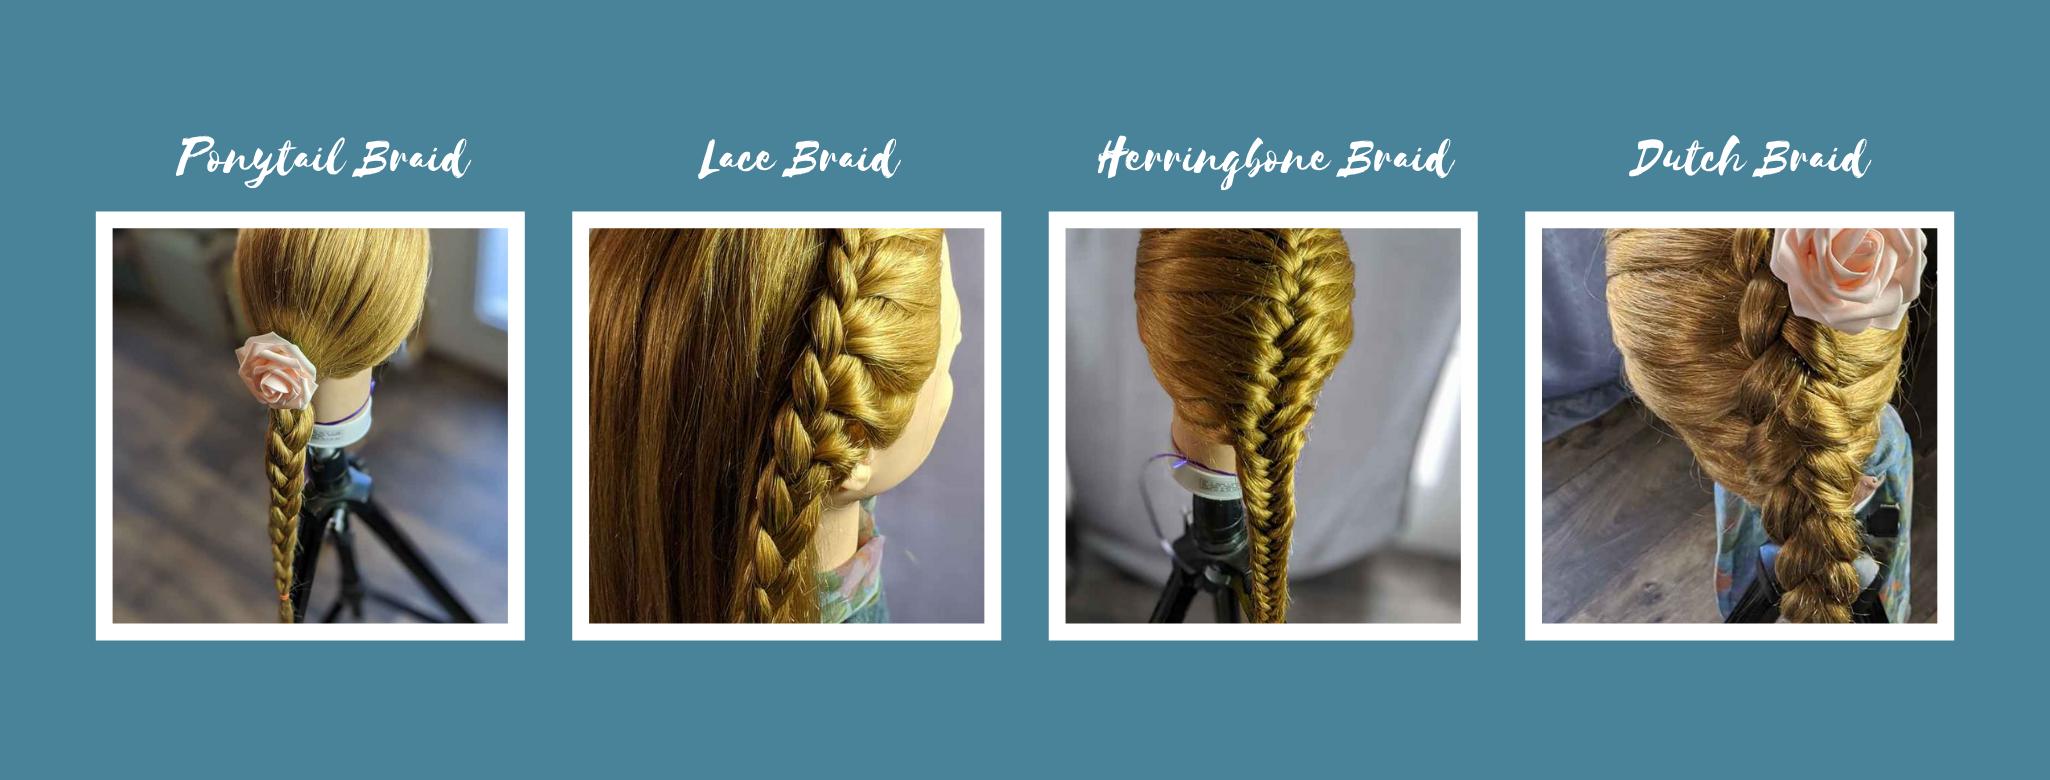 Braid Types_ Basic Course